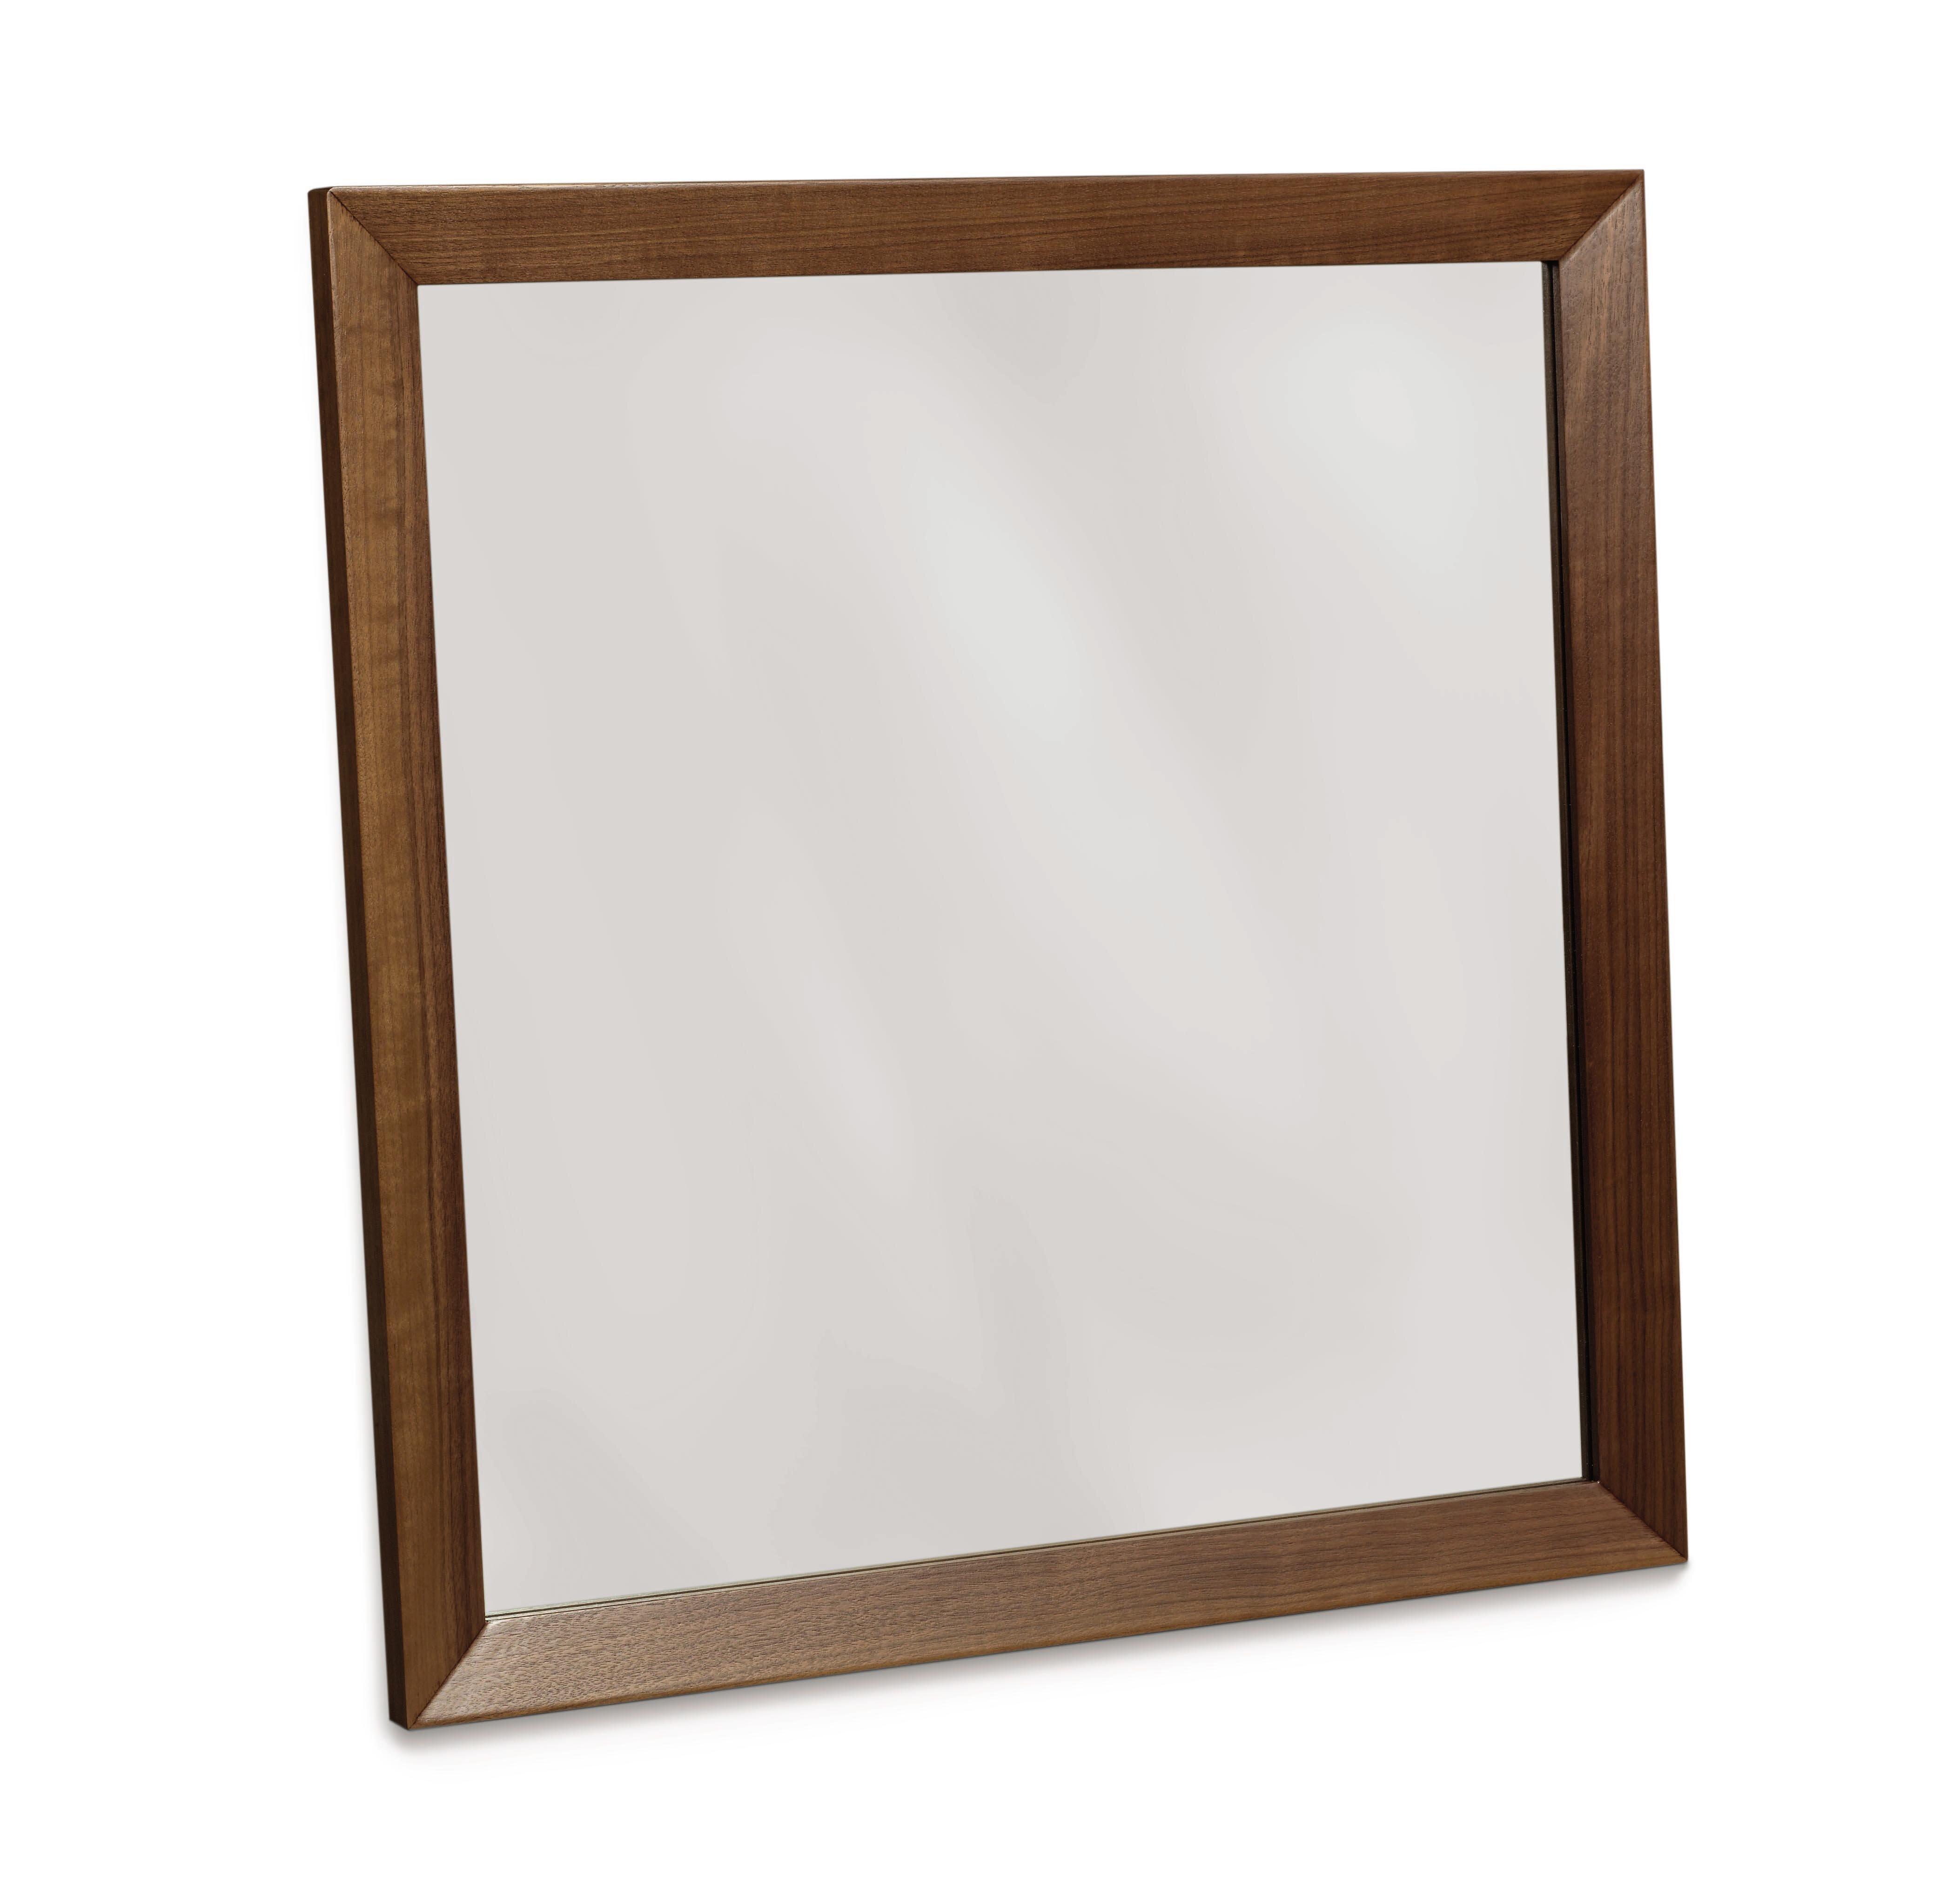 Copeland Furniture Astrid Wall Mirror Wayfair